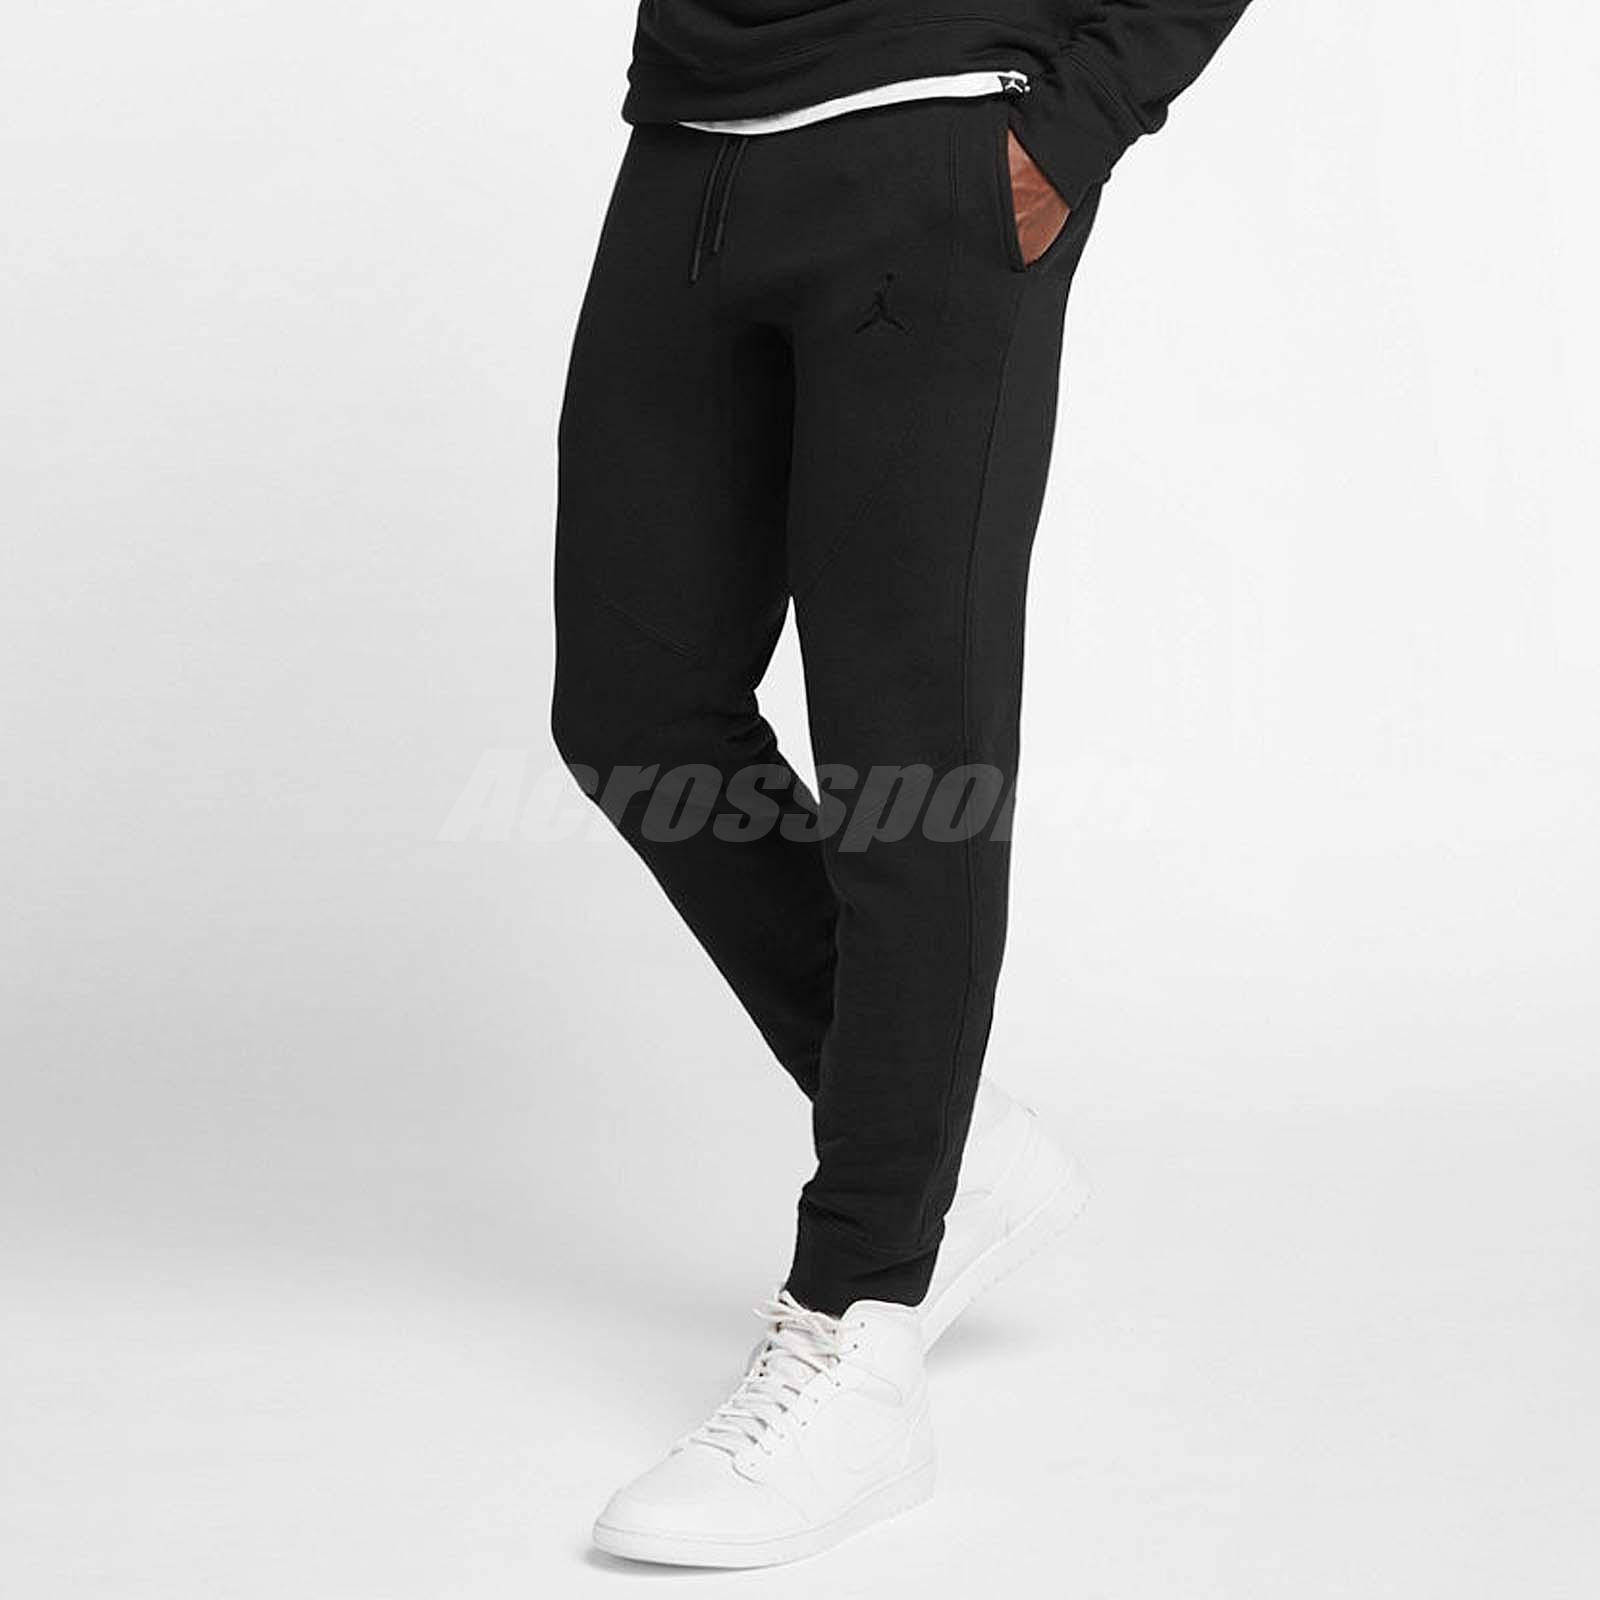 647d0cd0ea8 Details about Nike Men Wings Fleece Pants Air Jordan Jumpman Training Slim  AJ Black 860199-010